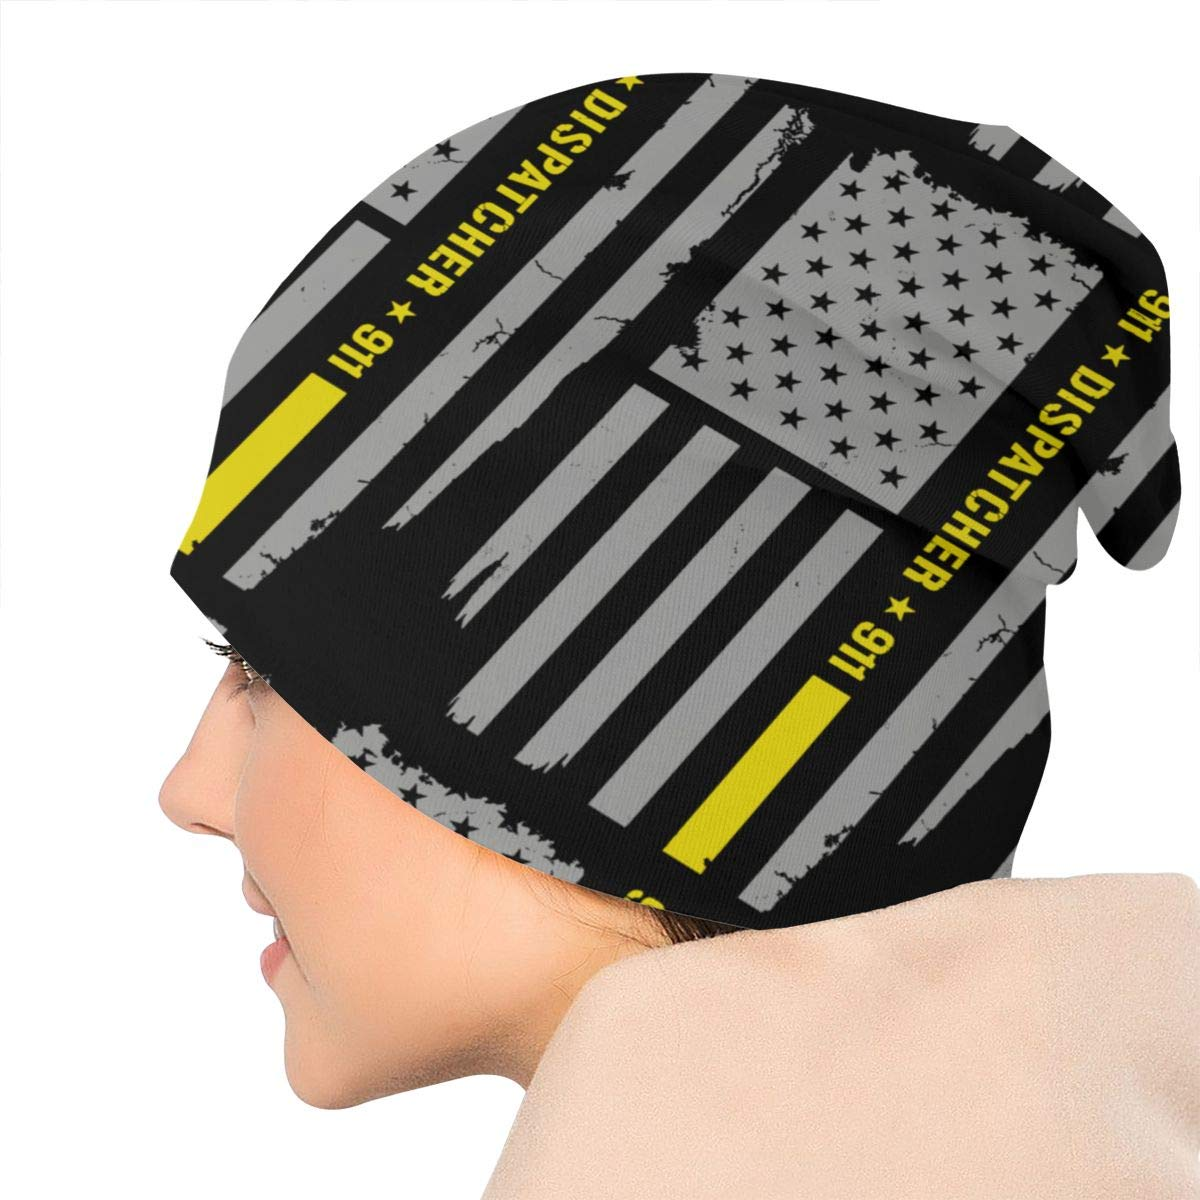 EleHtynqkakqo 911 Dispatcher Thin Gold Line Hat Hooded Hat Knit Hat Hat Skull Hat Knitted Hat Beanie Cap